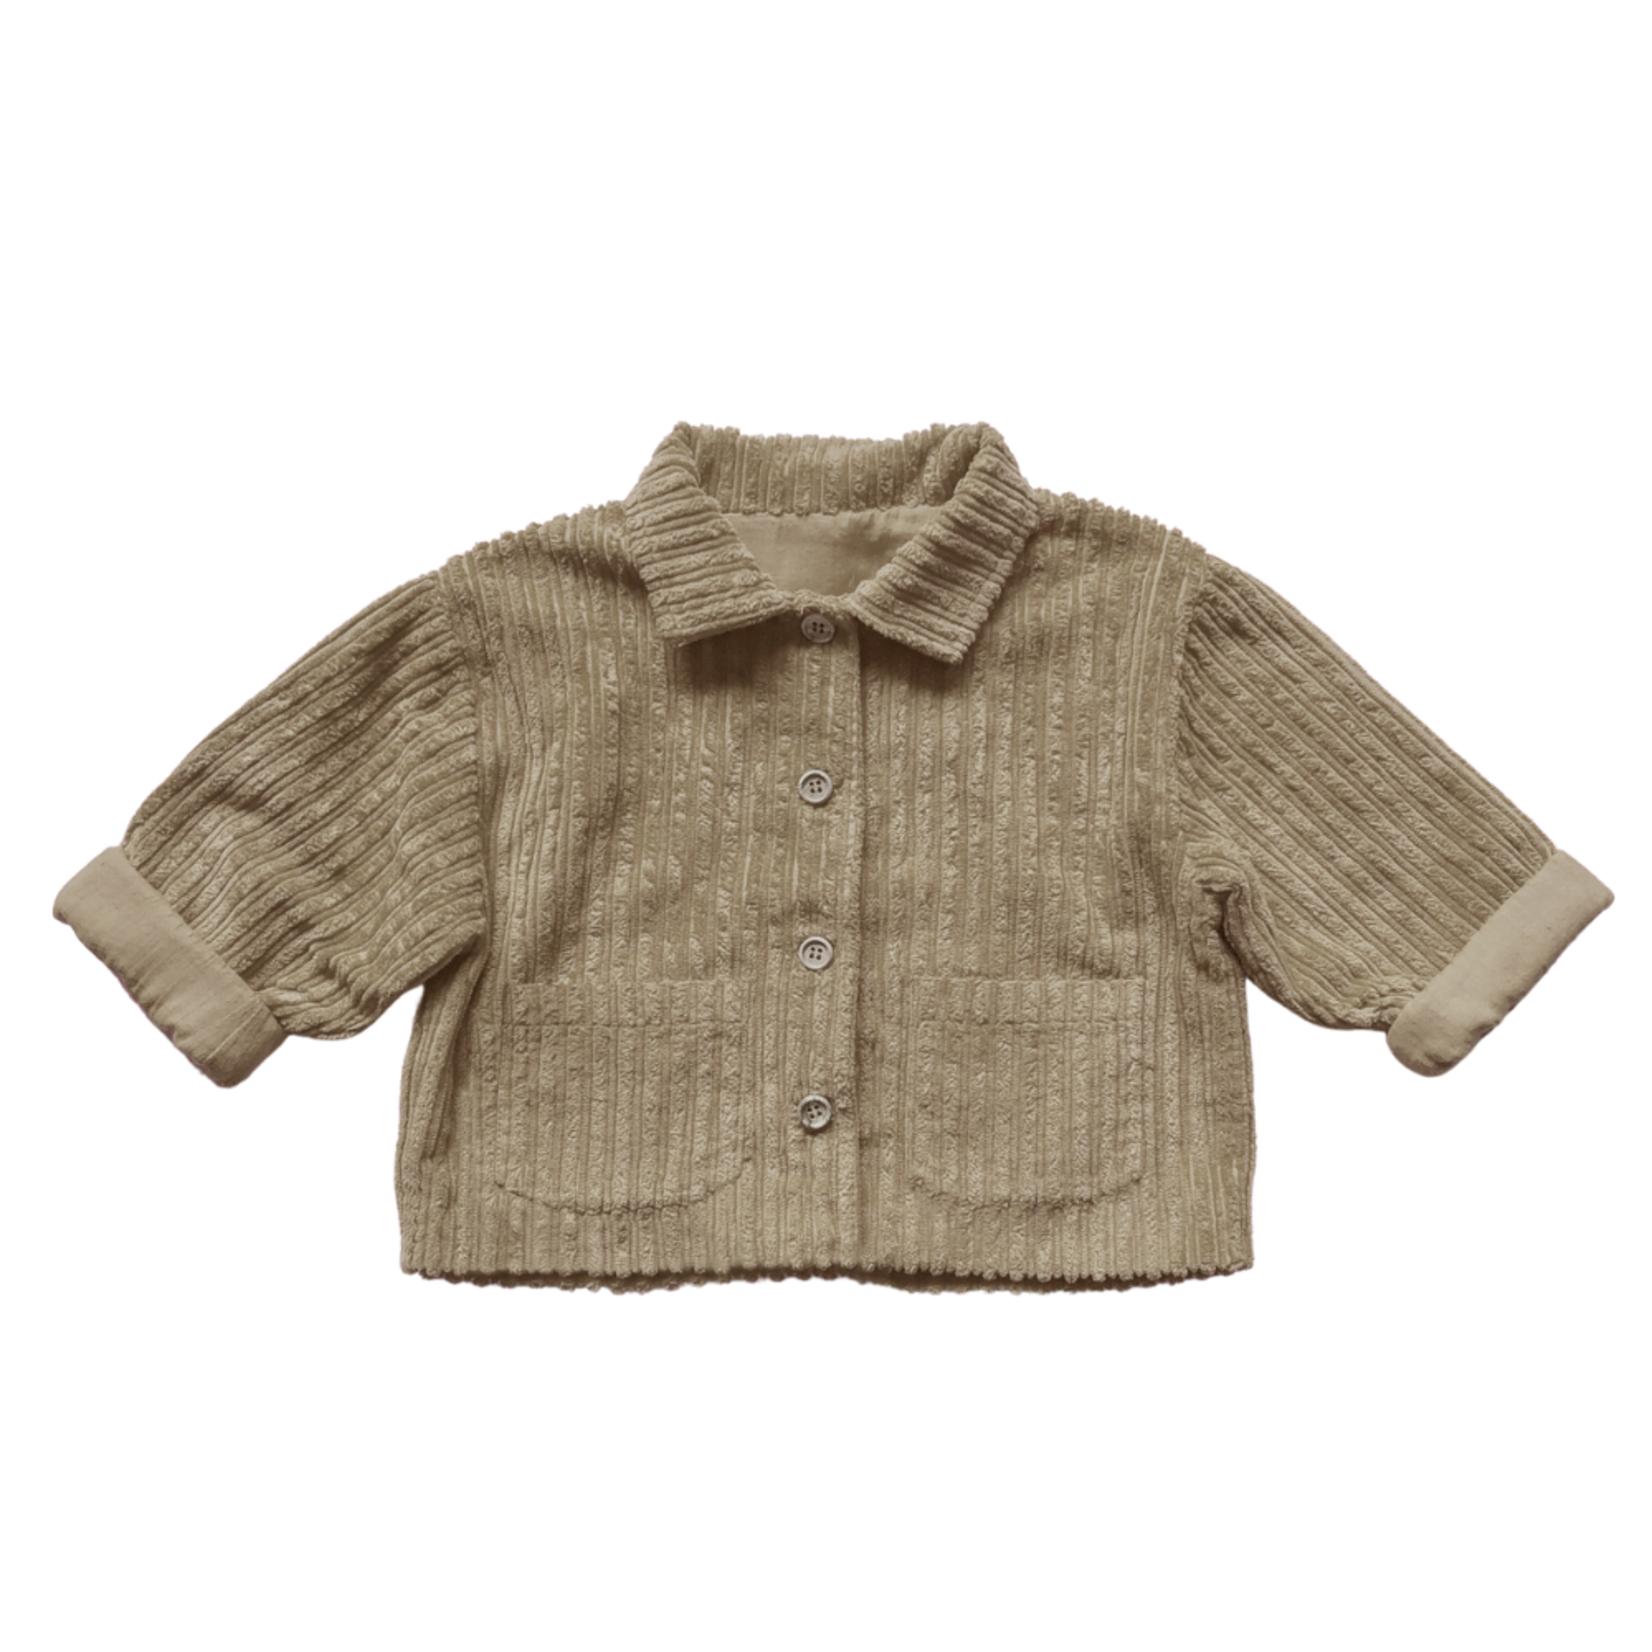 The Simple Folk The Vintage Corduroy Utility Jacket